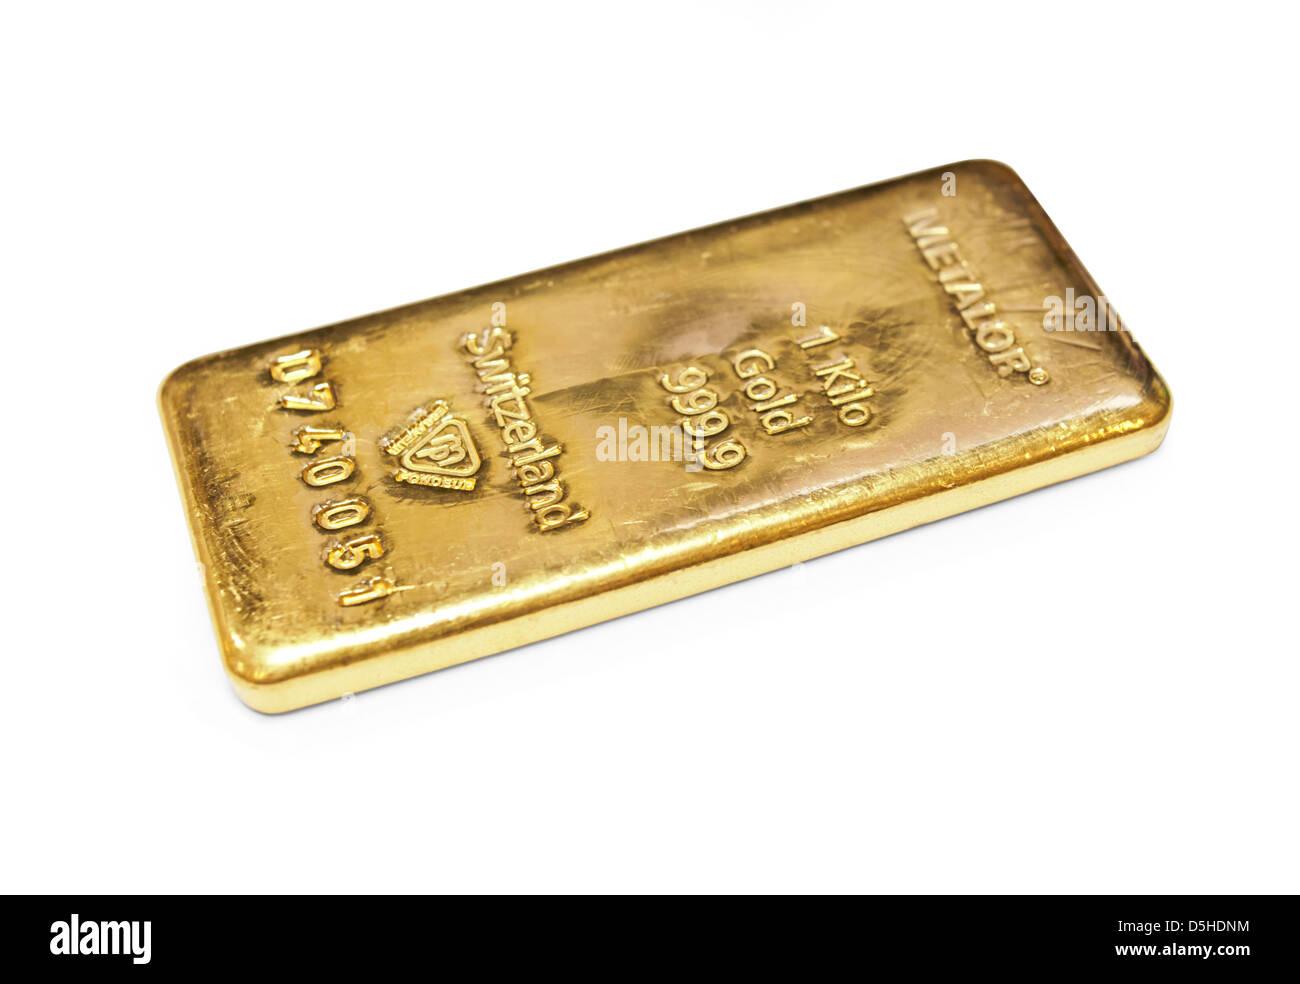 One kilogram gold bar on white background - Stock Image